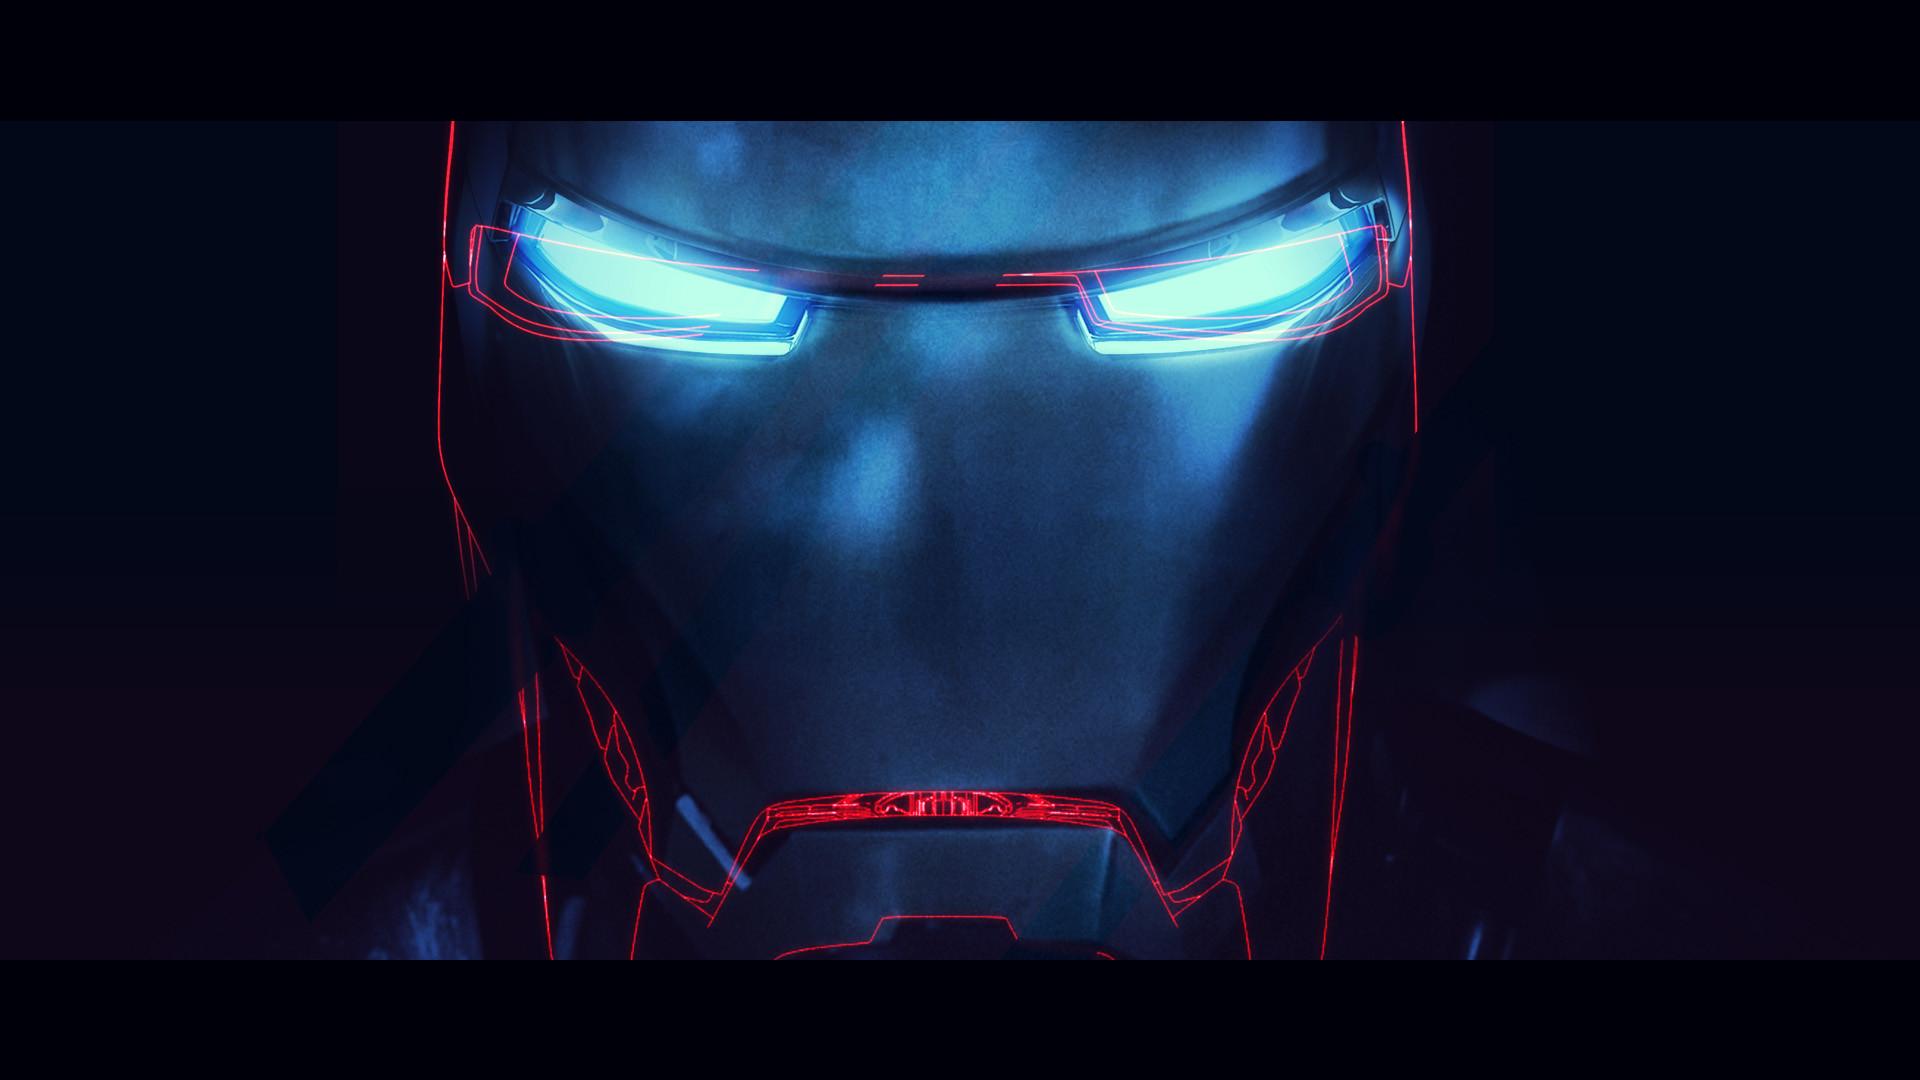 download iron man 3 live wallpaper full version apk